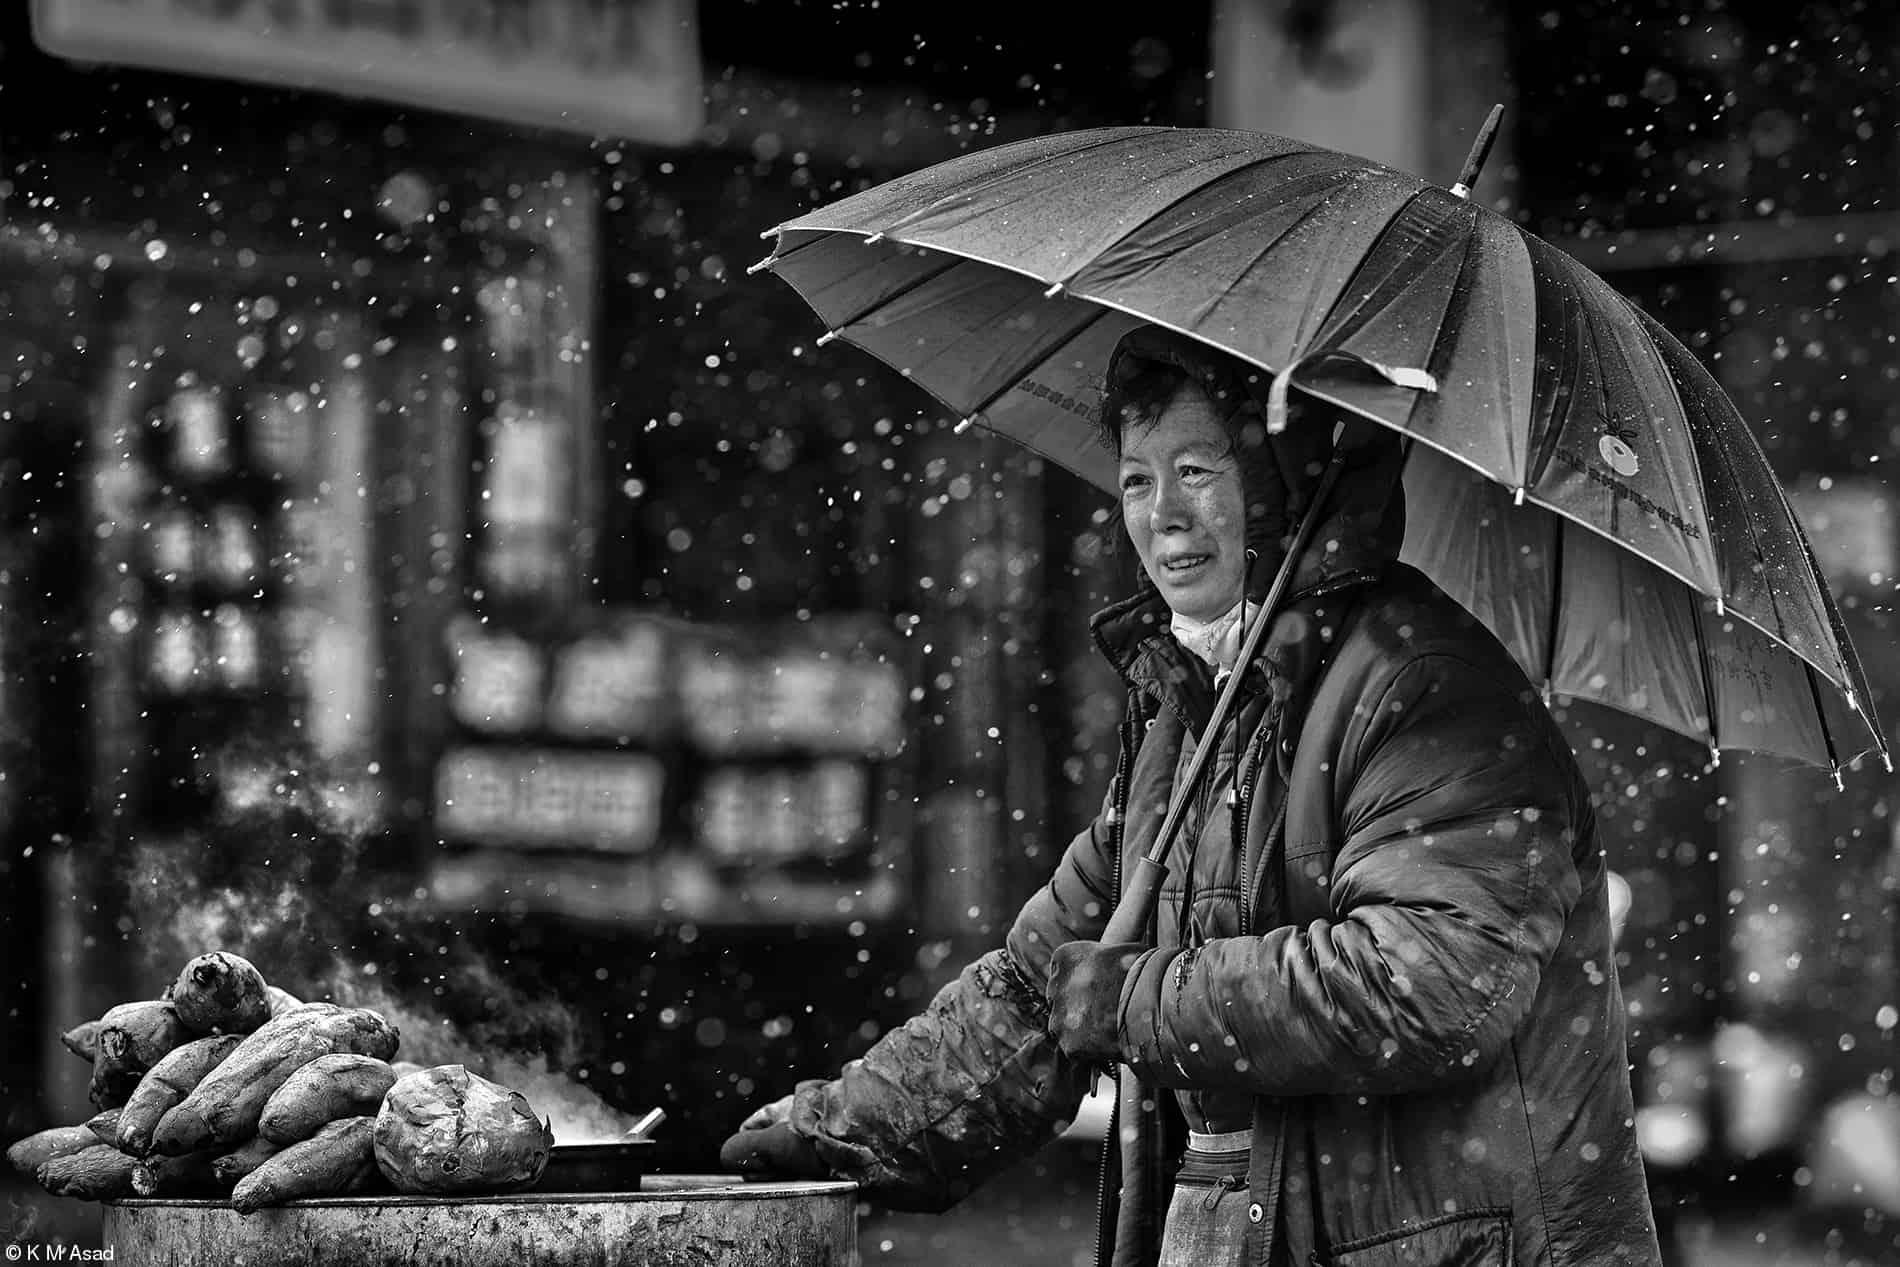 Street photography_K M Asad_Sweet Potato_Lo Res